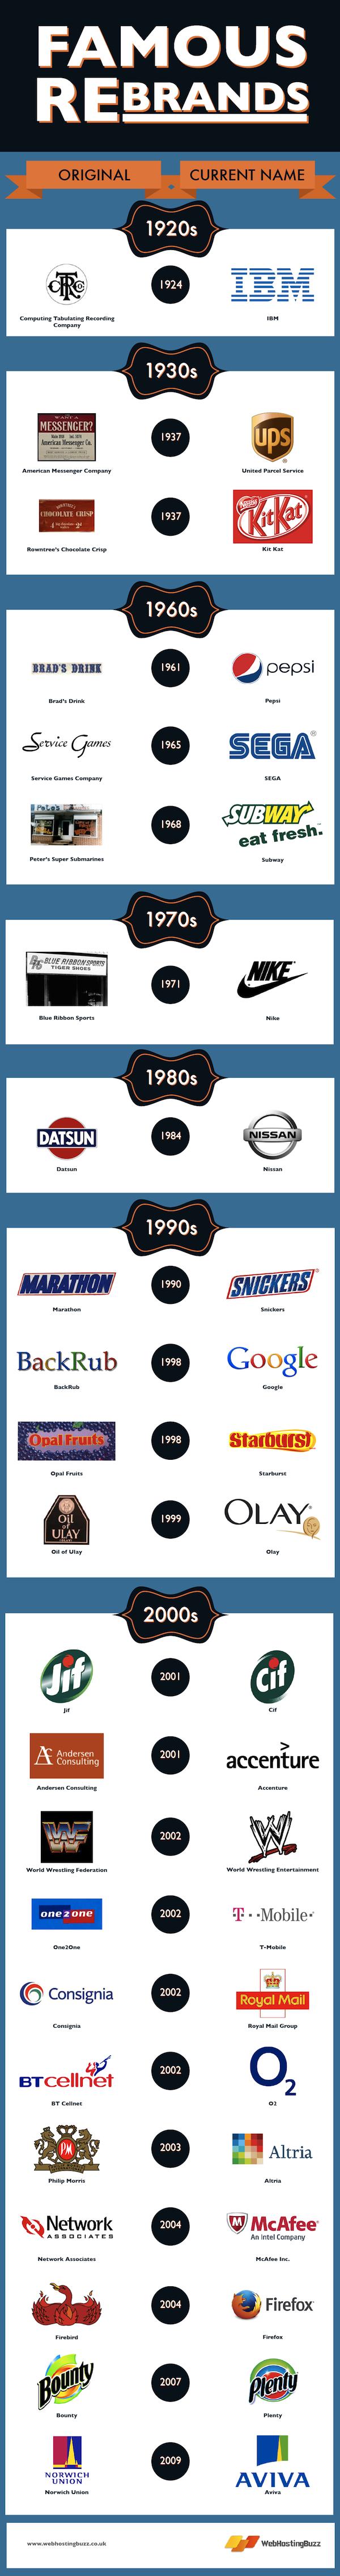 rebranding-examples